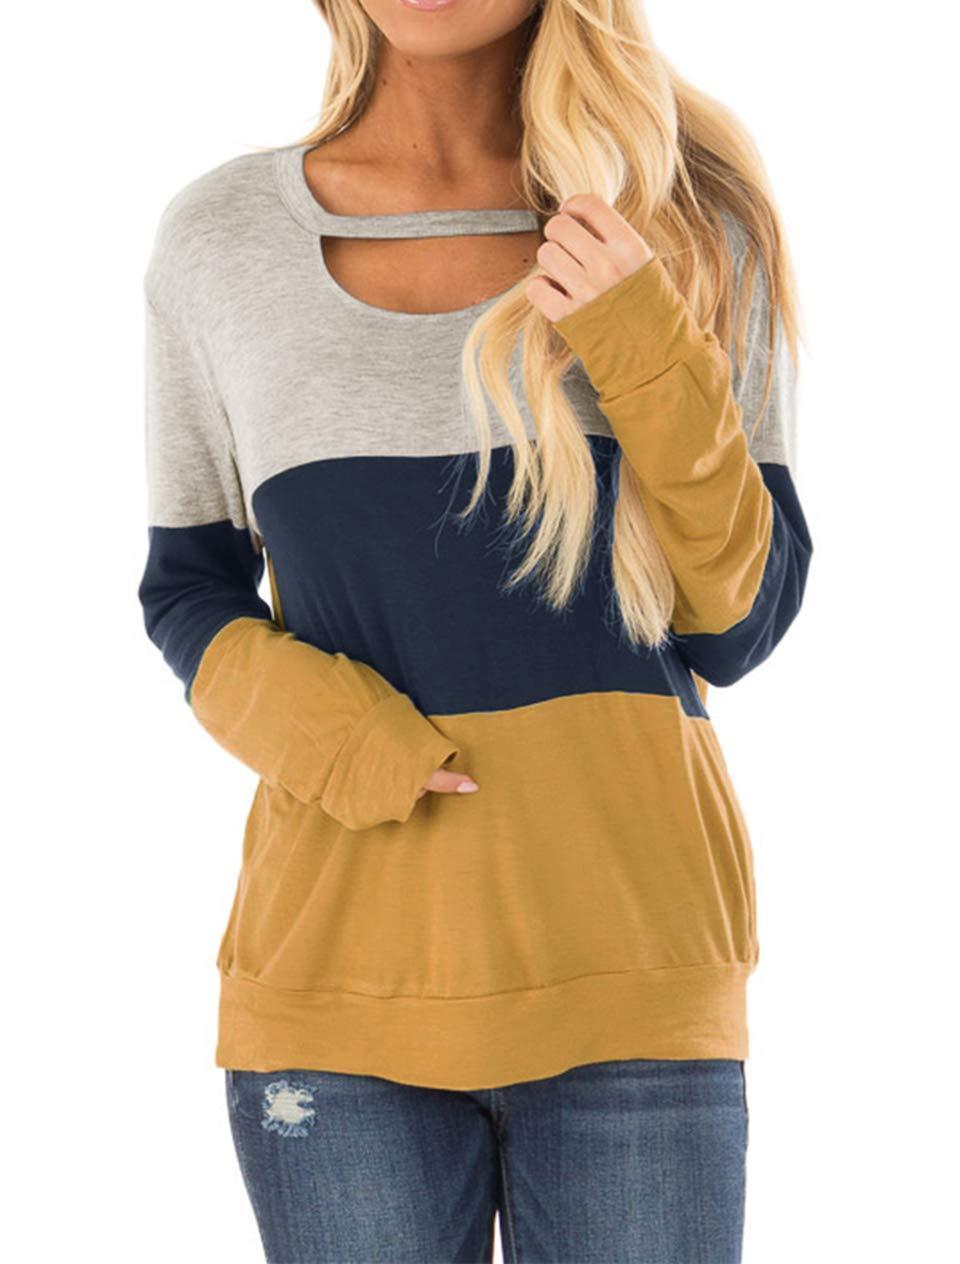 Minclouse Women's Color Block Long Sleeves Tunic Cutout Choker Tops Crew Neck Casual Loose Blouses Cute Sweatshirts